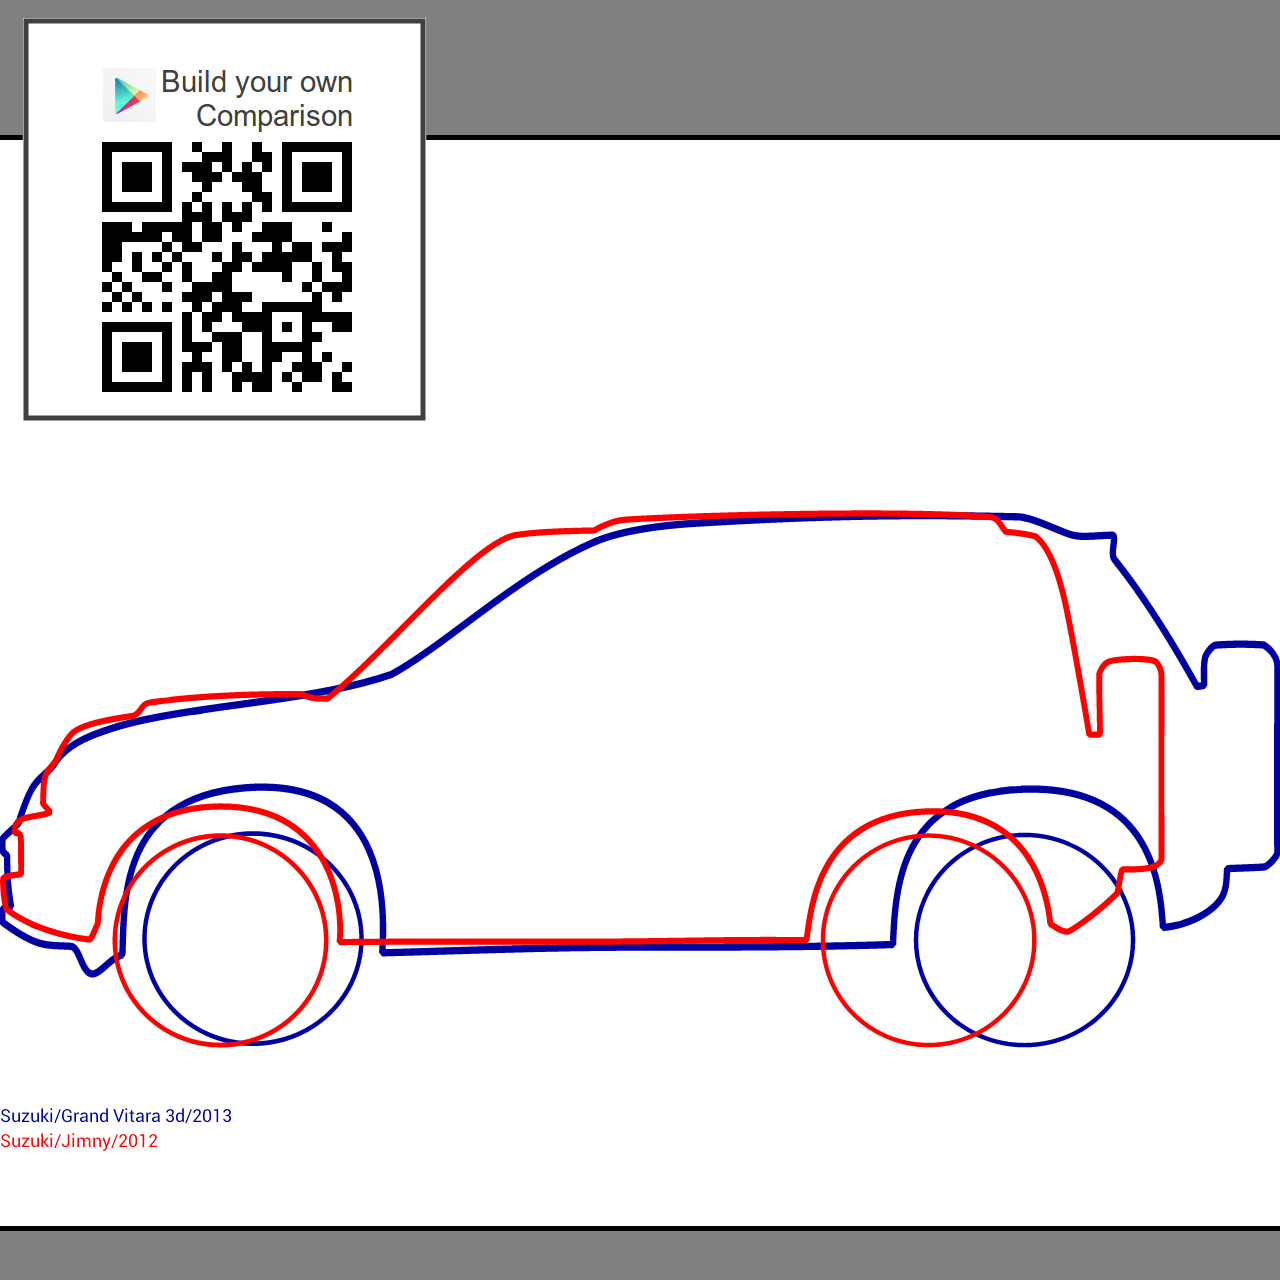 Suzuki Jimny 2012 vs Suzuki Grand Vitara 3D 2013 - Compare dimensions